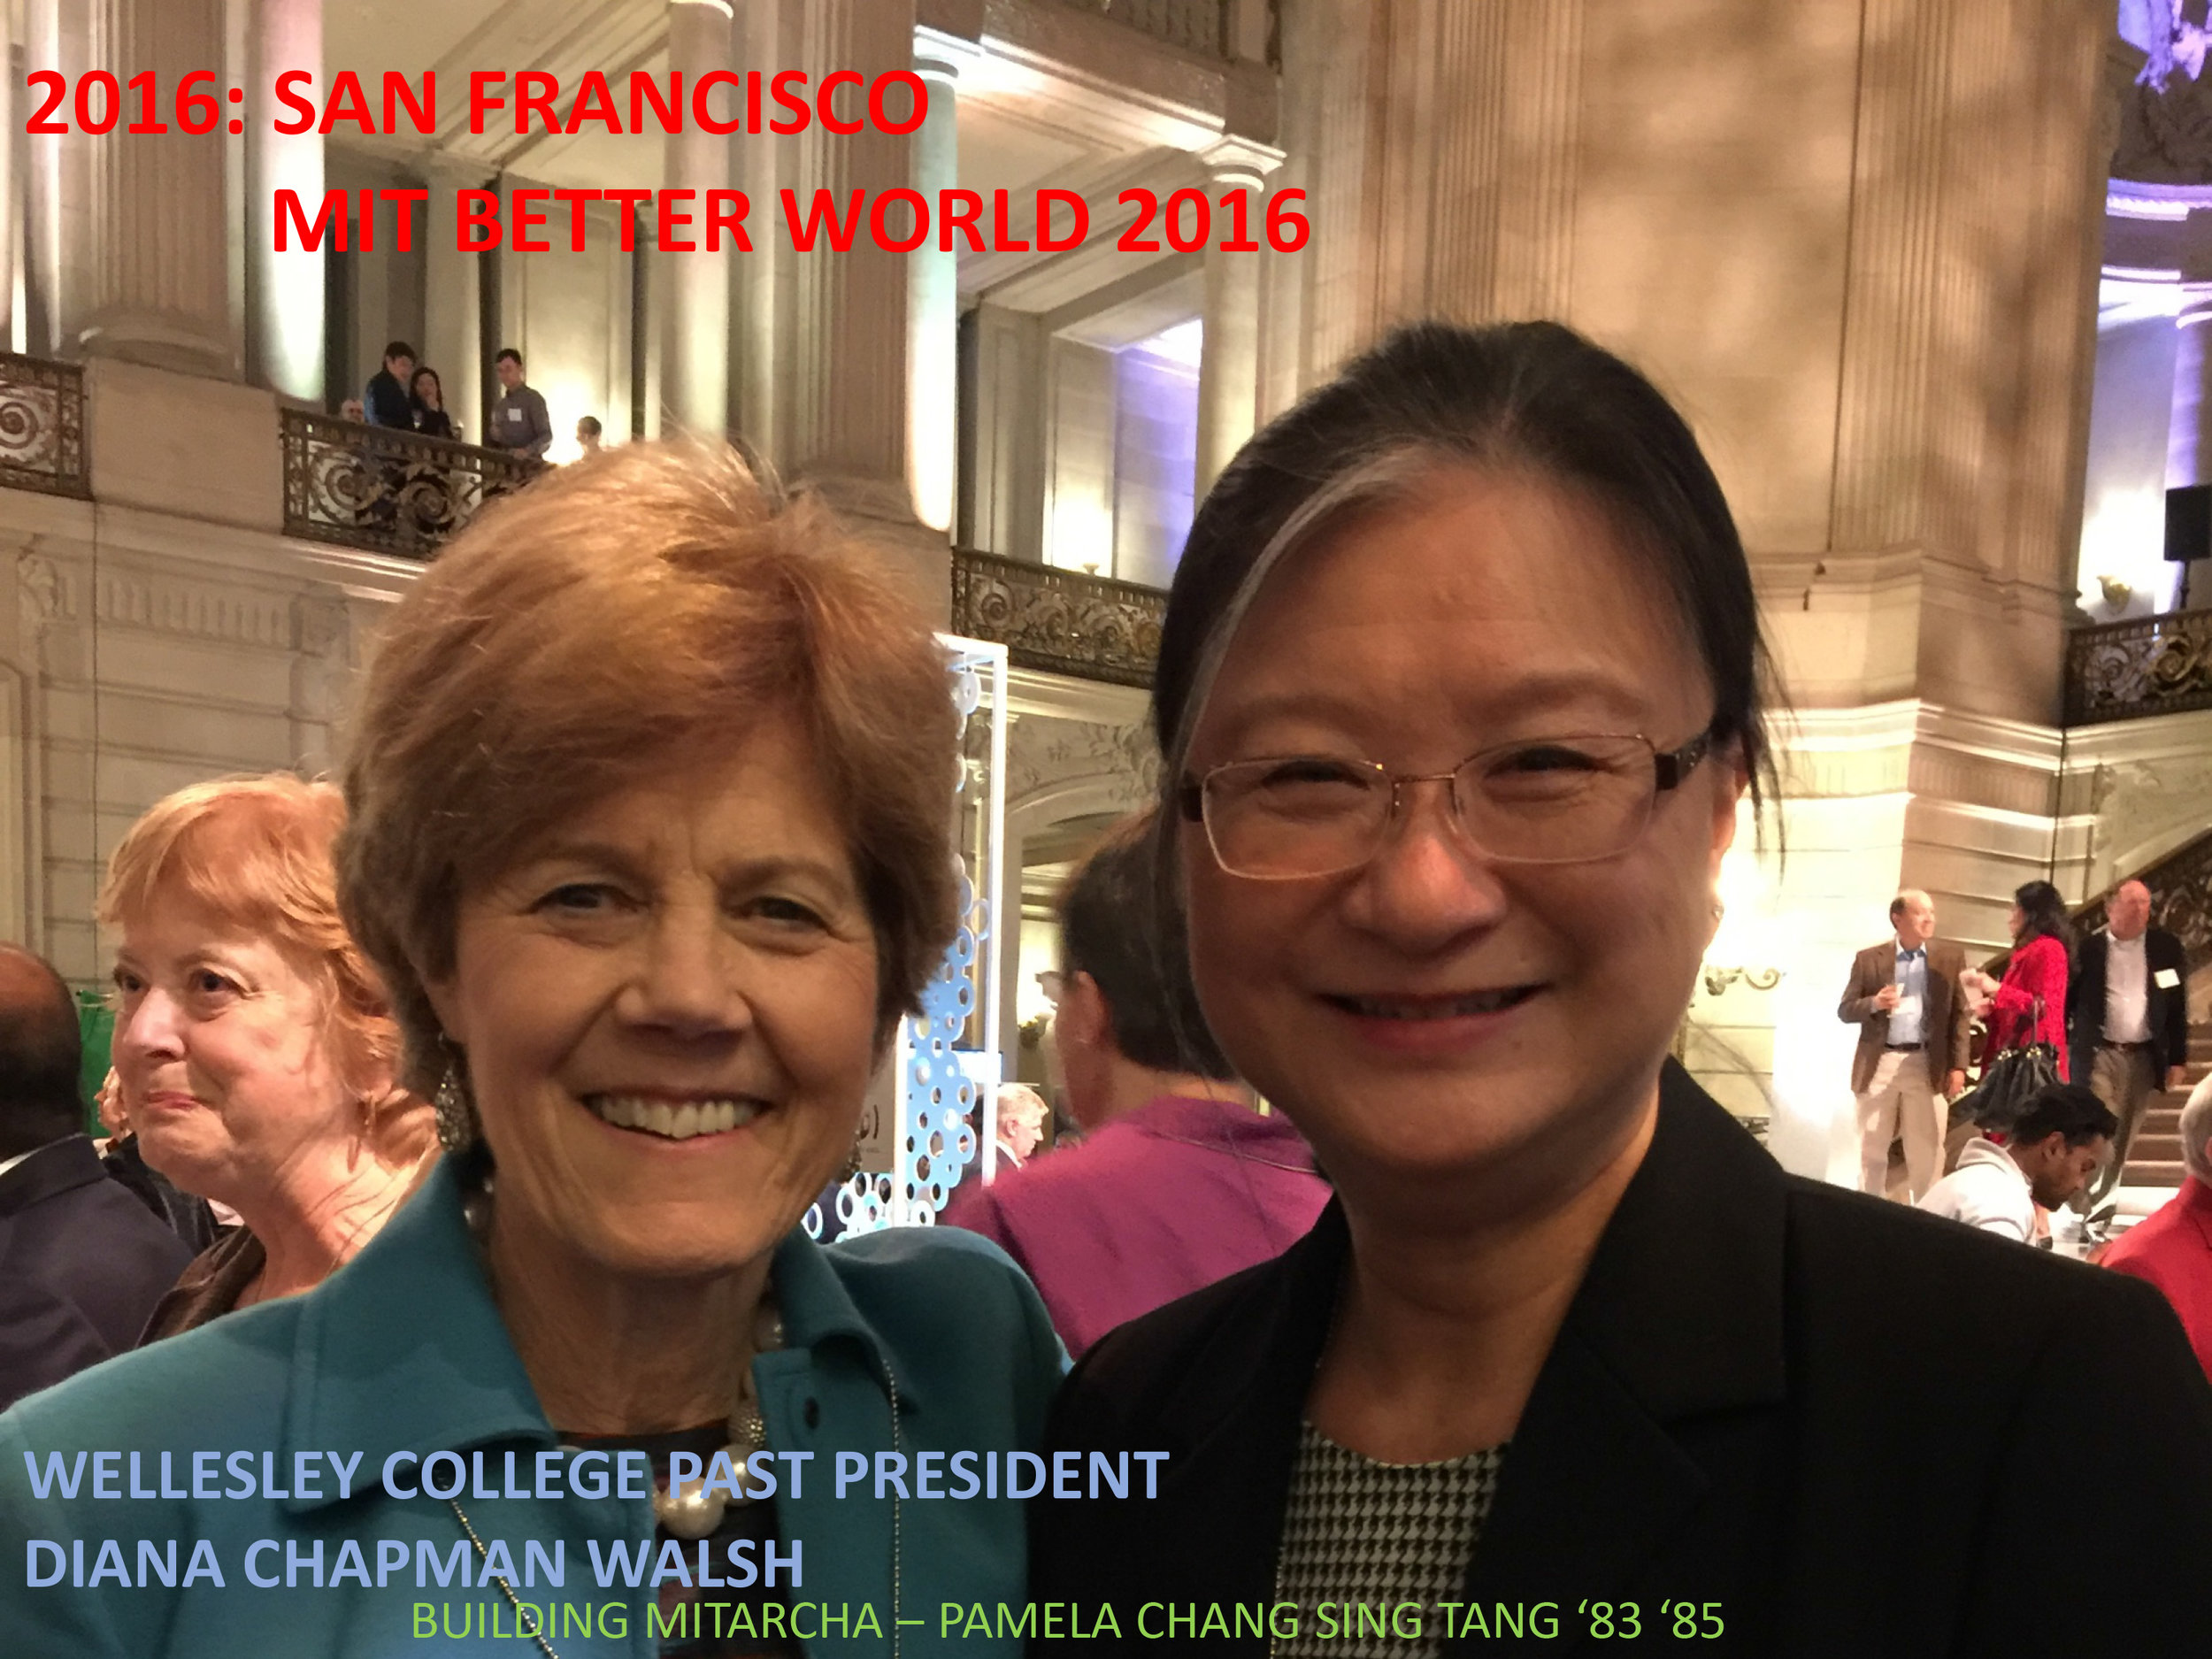 MIT ARCHITECTURE 150 SAN FRANCISCO SLIDESHOW-13 copy.jpg